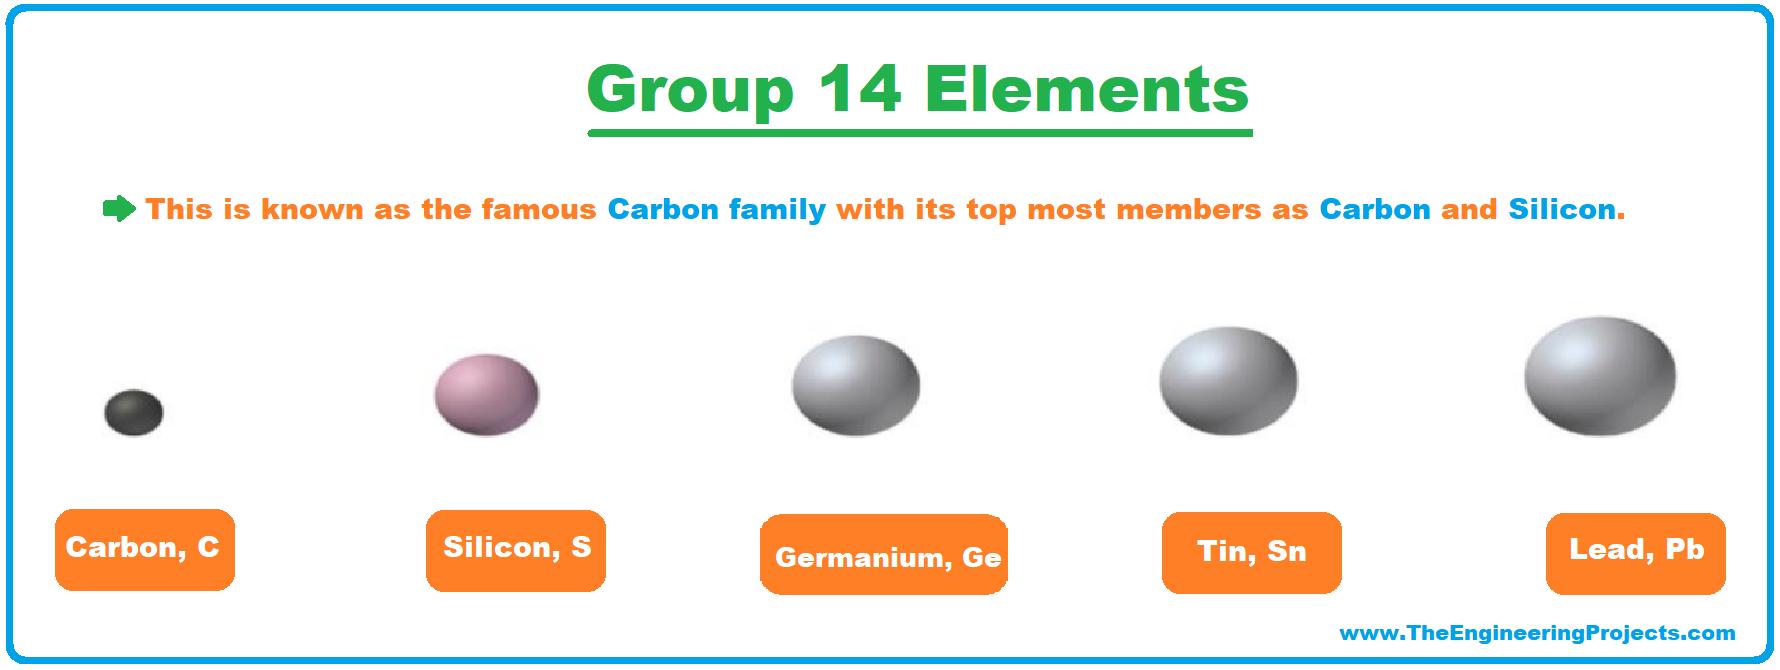 History of Periodic Table, Periodic Table, periodic table deifnition, periodic table group14, group14 of periodic table, carbon family, periodic table trends